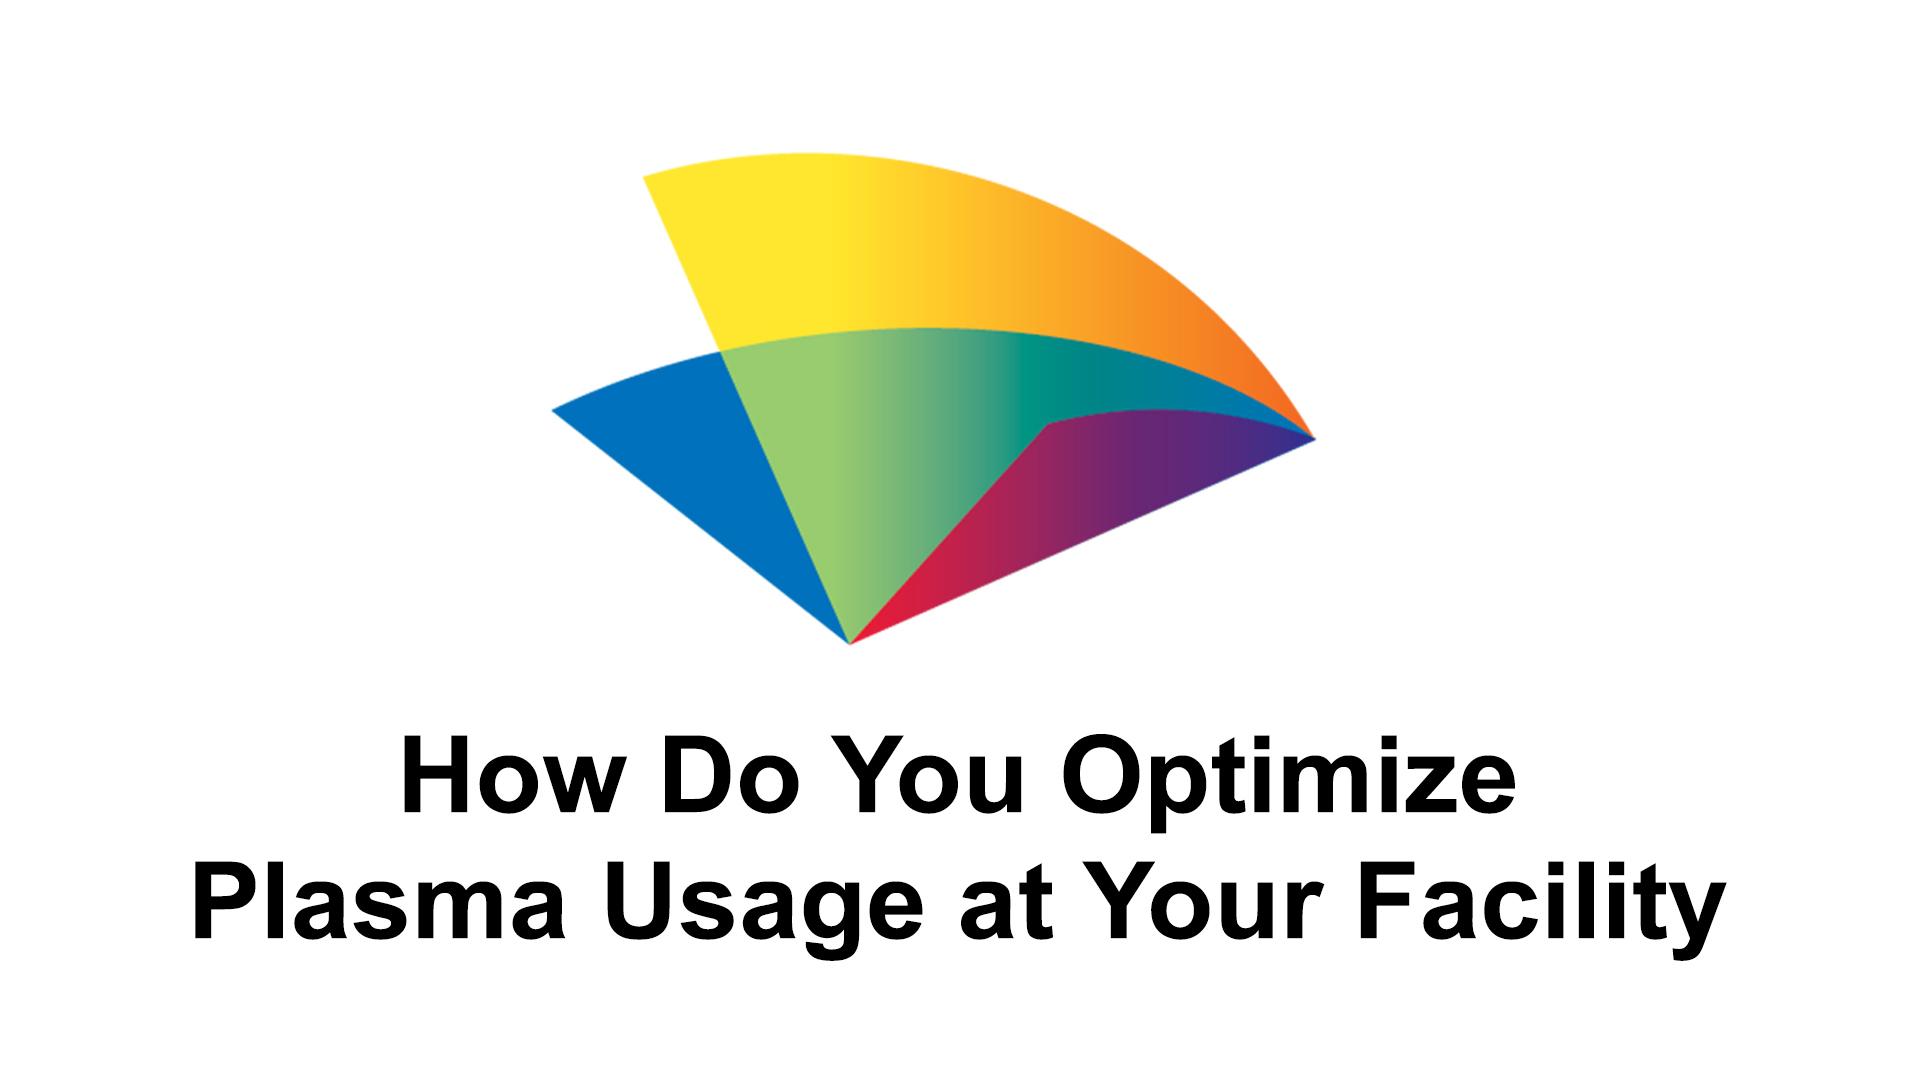 4-how-do-you-optimize-plasma-usage-at-your-facility